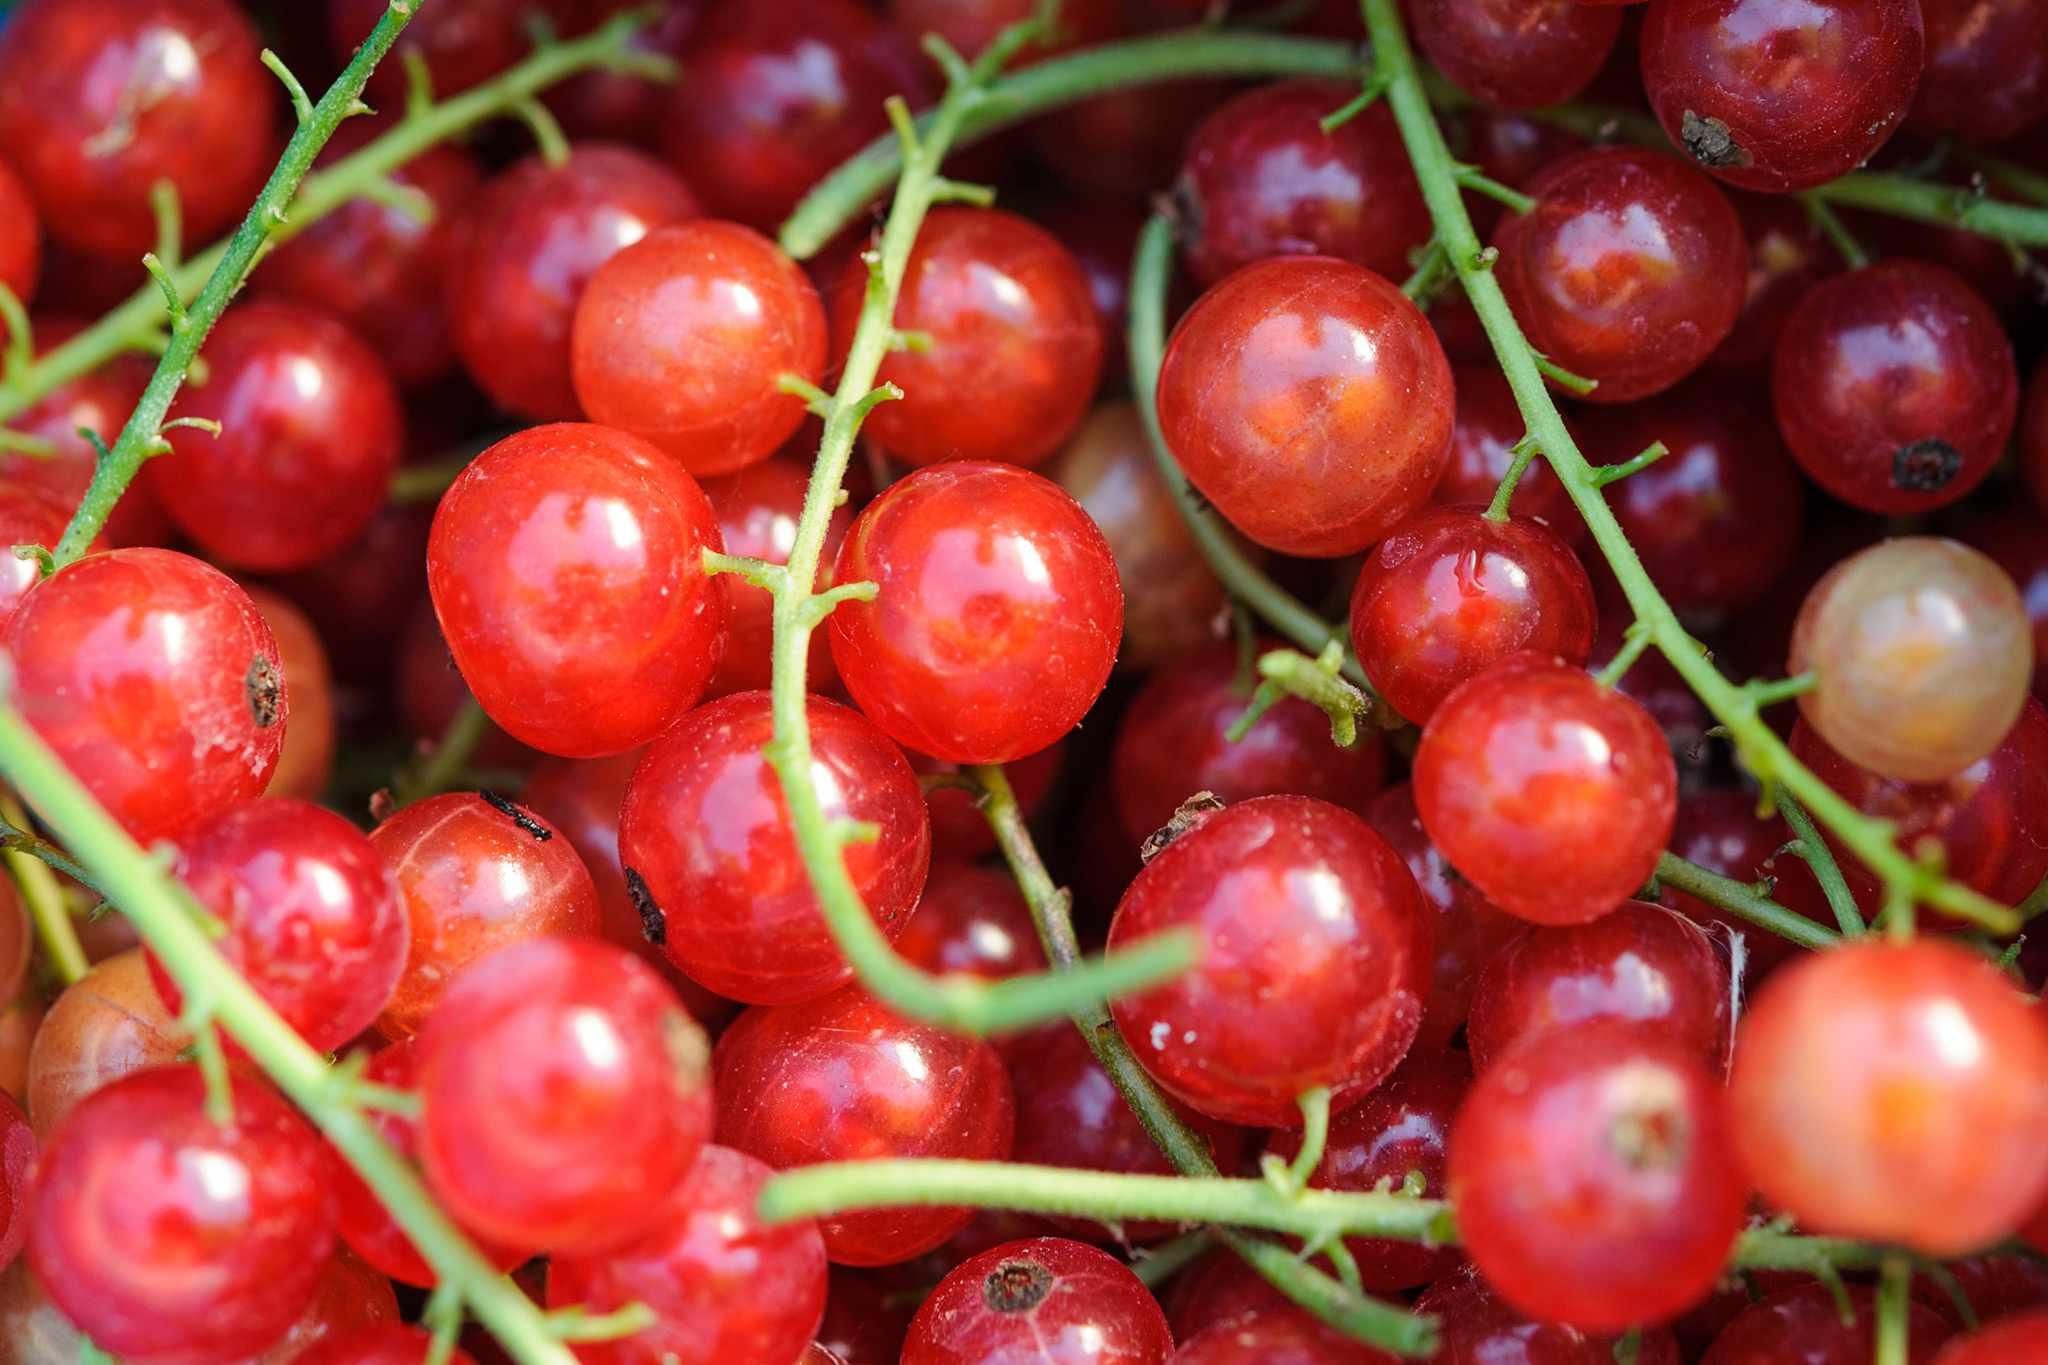 How to prune redcurrants and gooseberries video